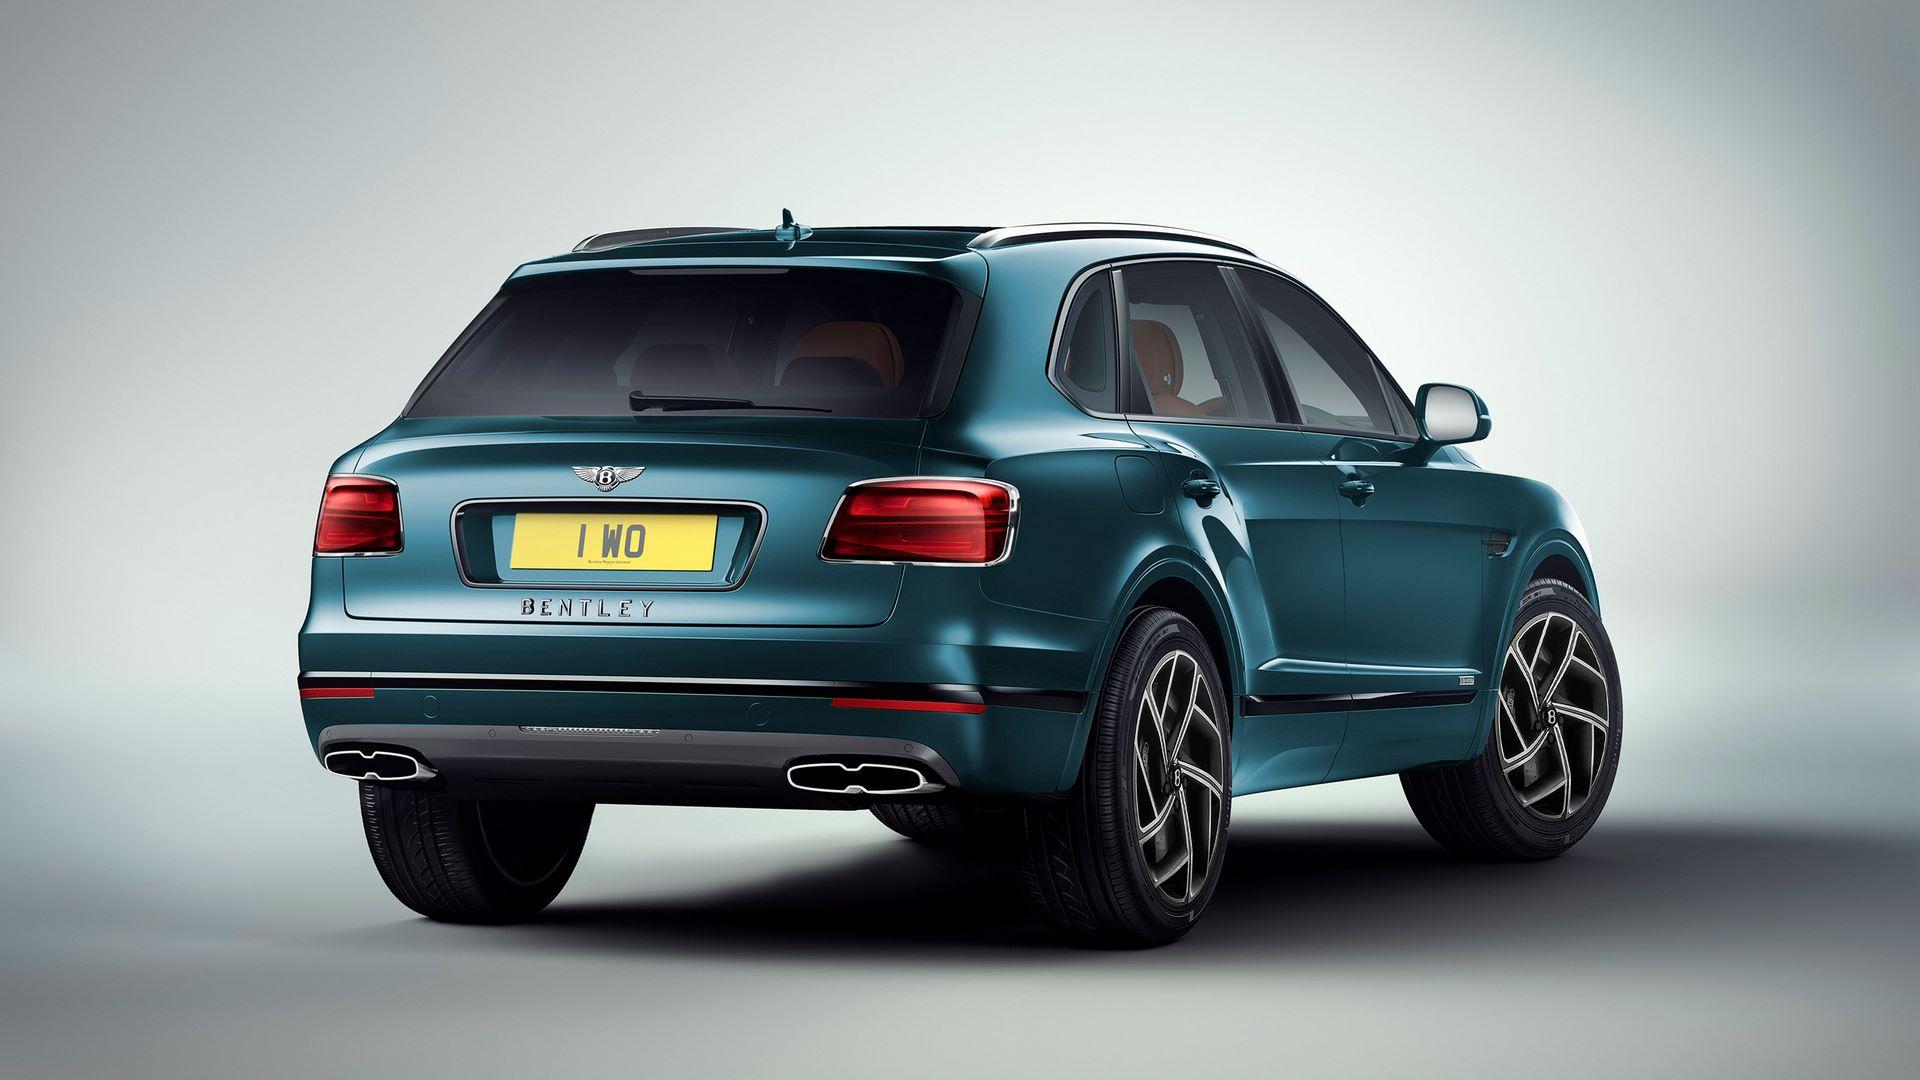 Bentley-Bentayga-facelift-2022-2